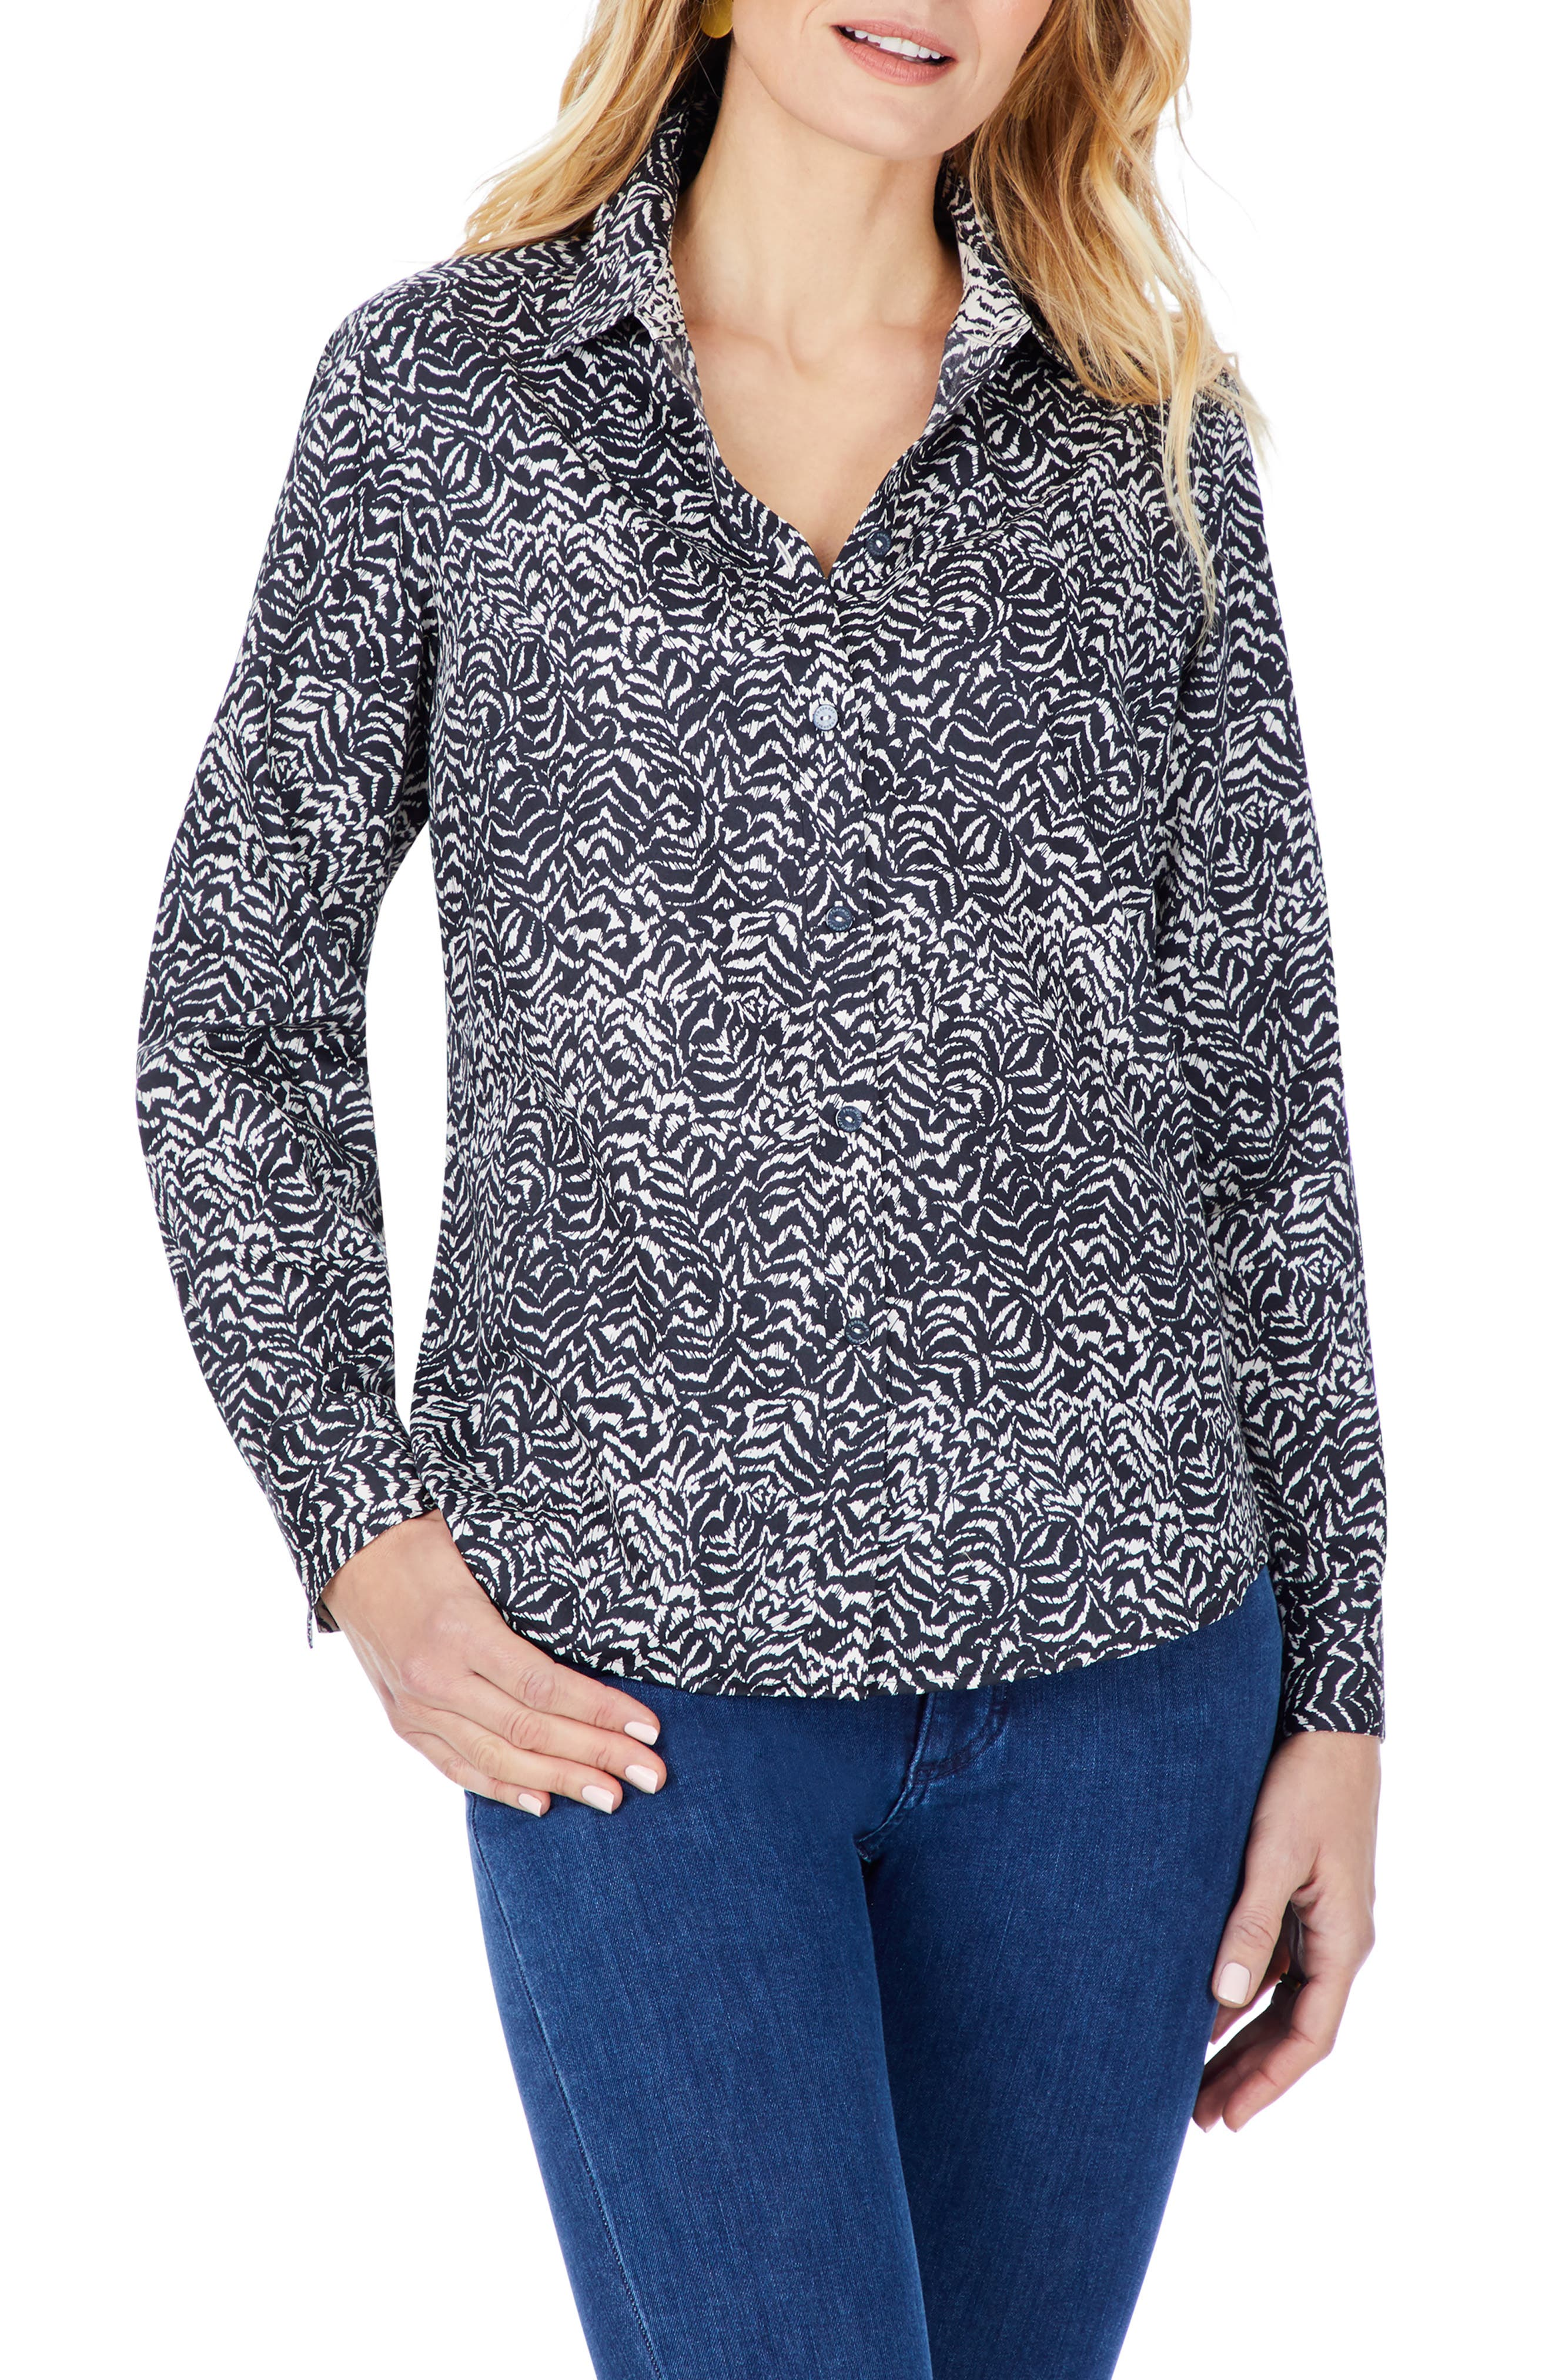 Ava Zebra Print Non-Iron Cotton Button-Up Shirt